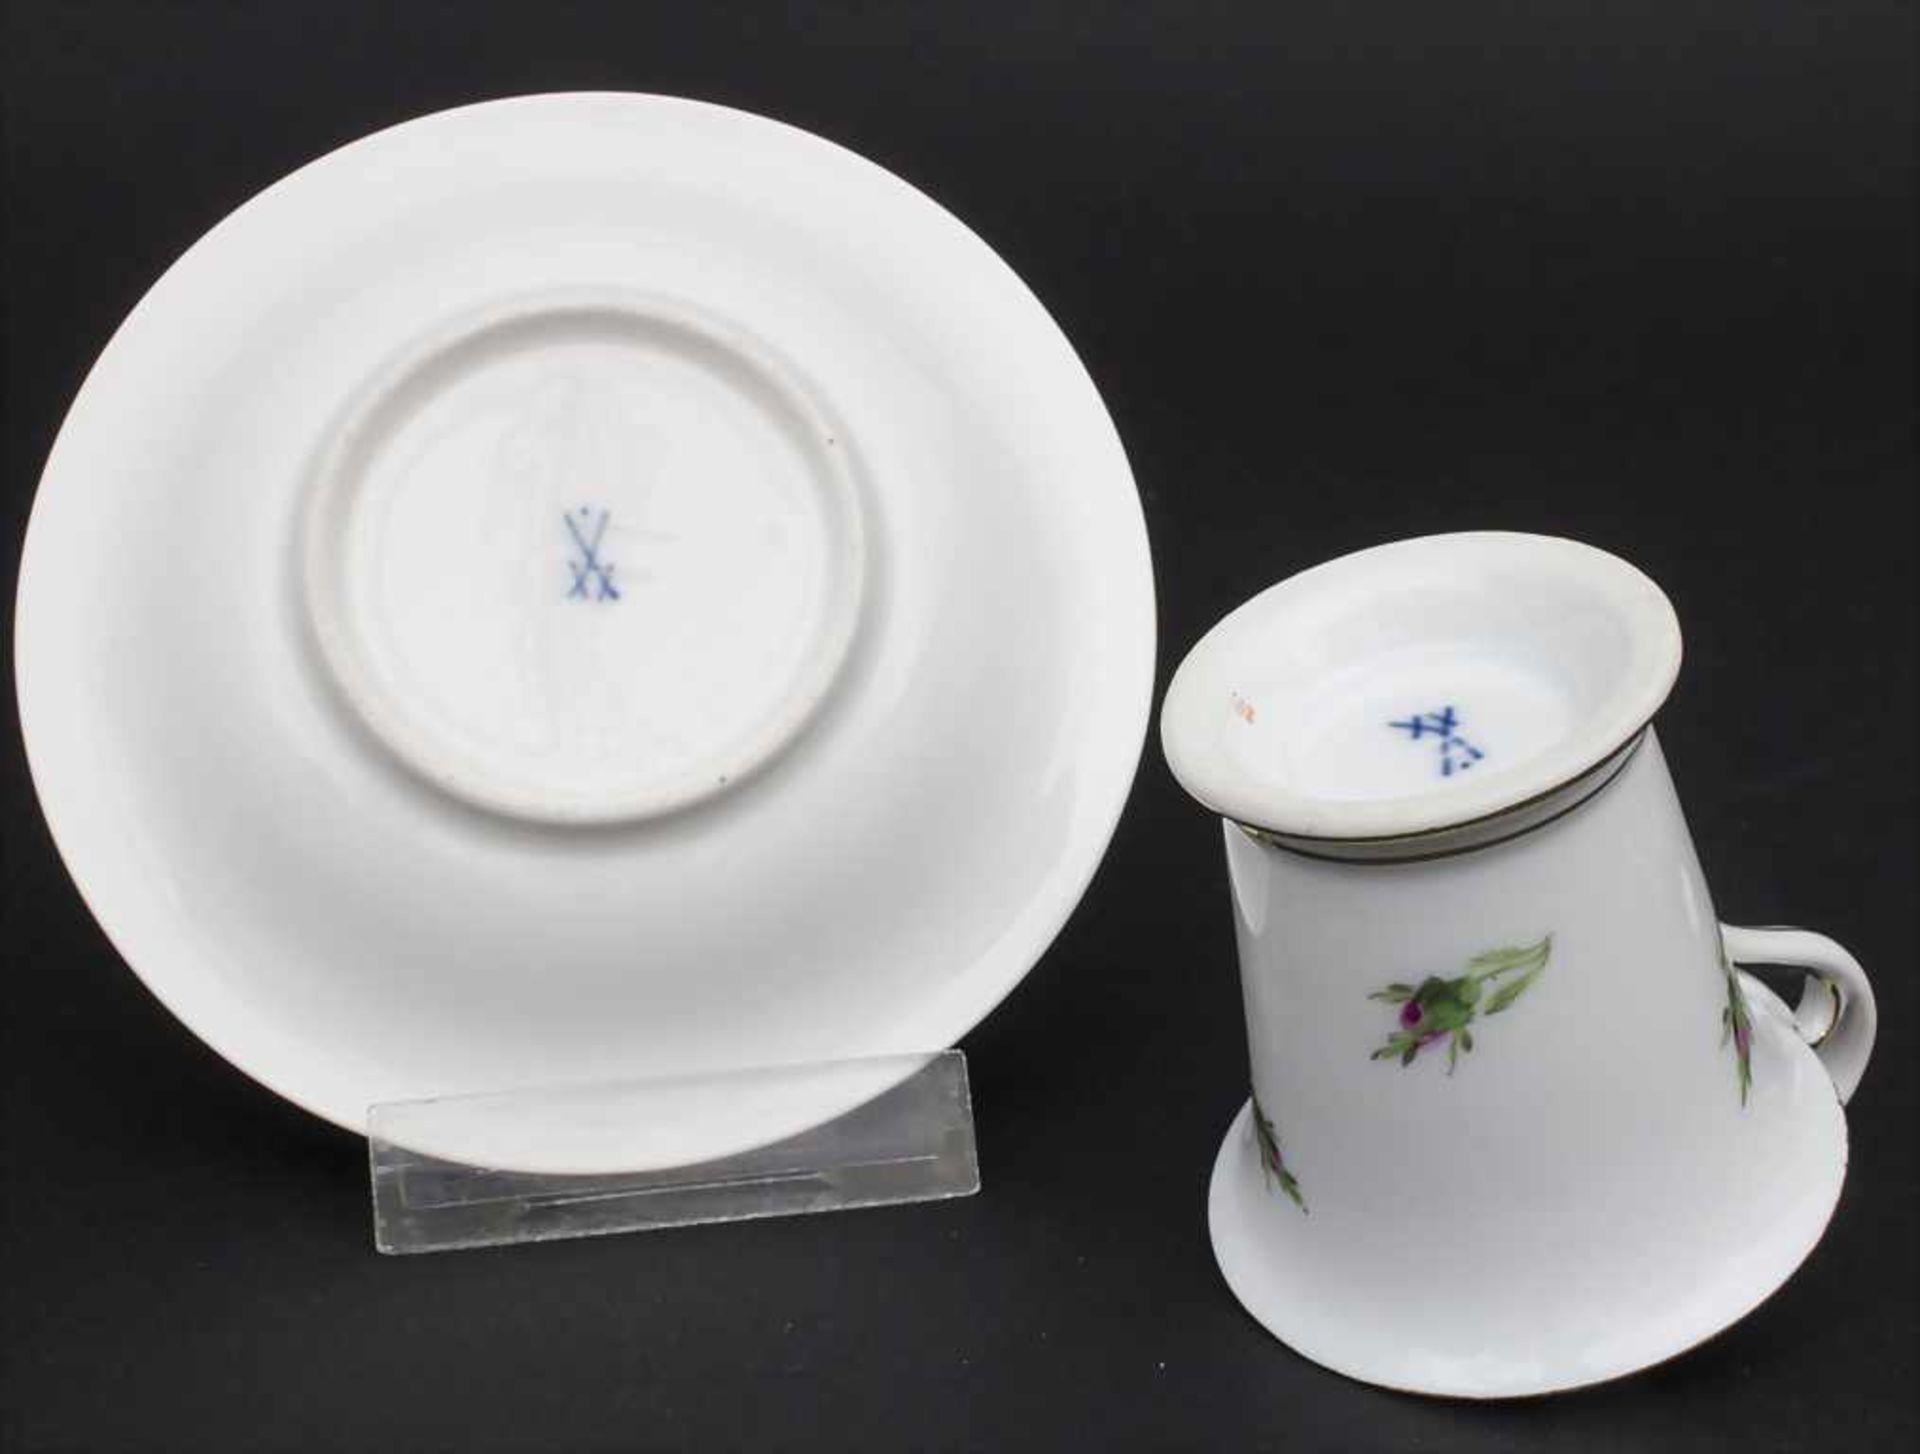 Konvolut Porzellane mit Rosendekor / A set of porcelain with roses, Meissen, 20. Jh. - Bild 7 aus 13